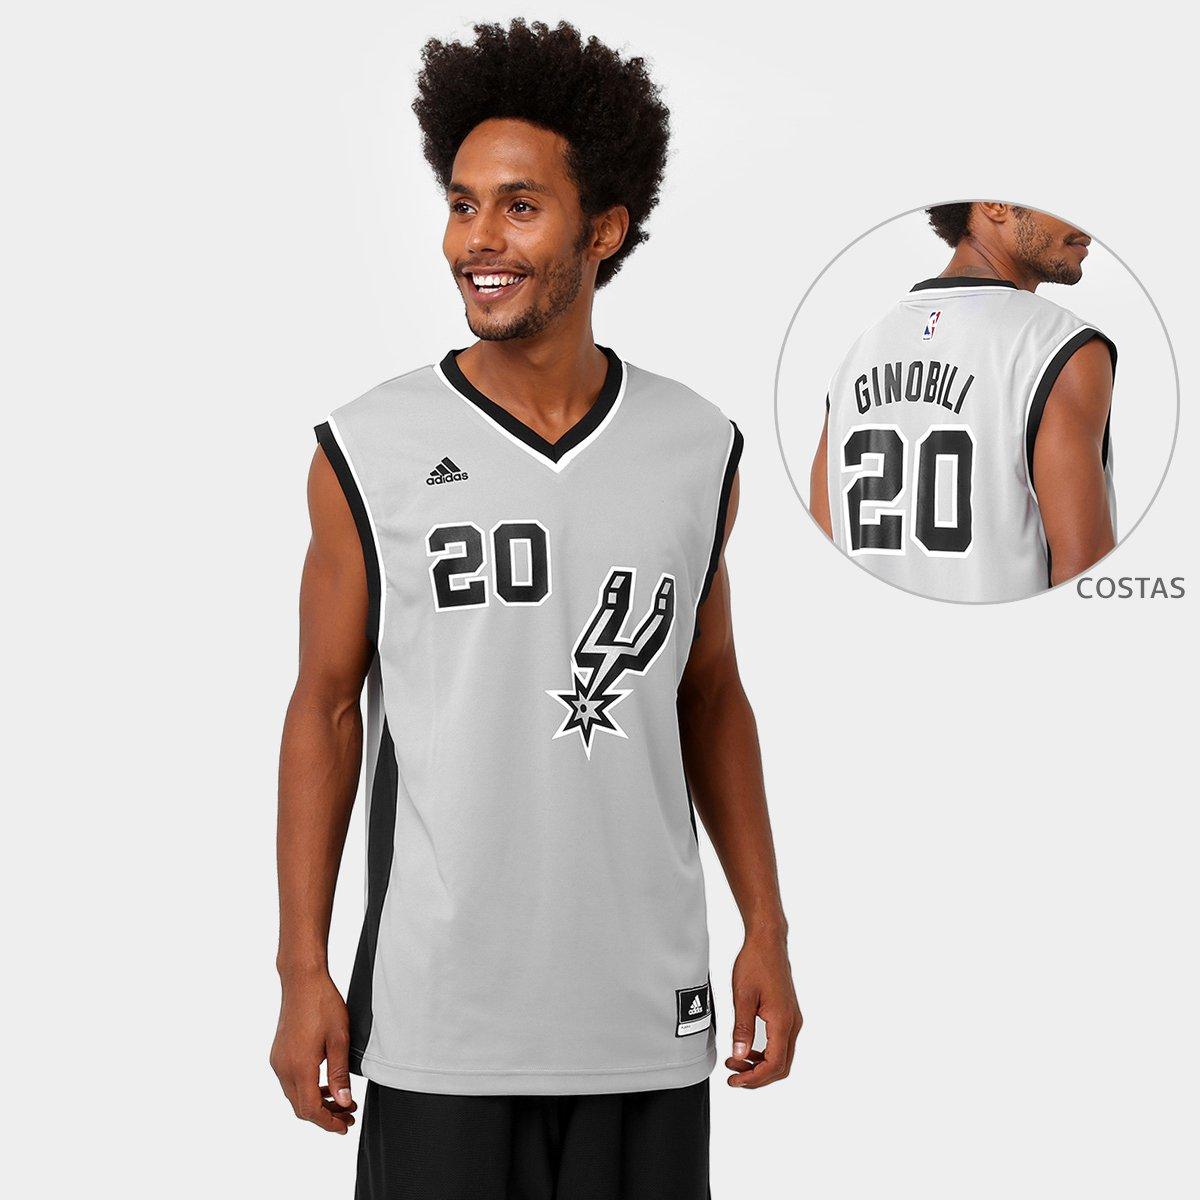 aac4cb5cc Camiseta Regata Adidas NBA San Antonio Spurs - Ginobili - Compre Agora